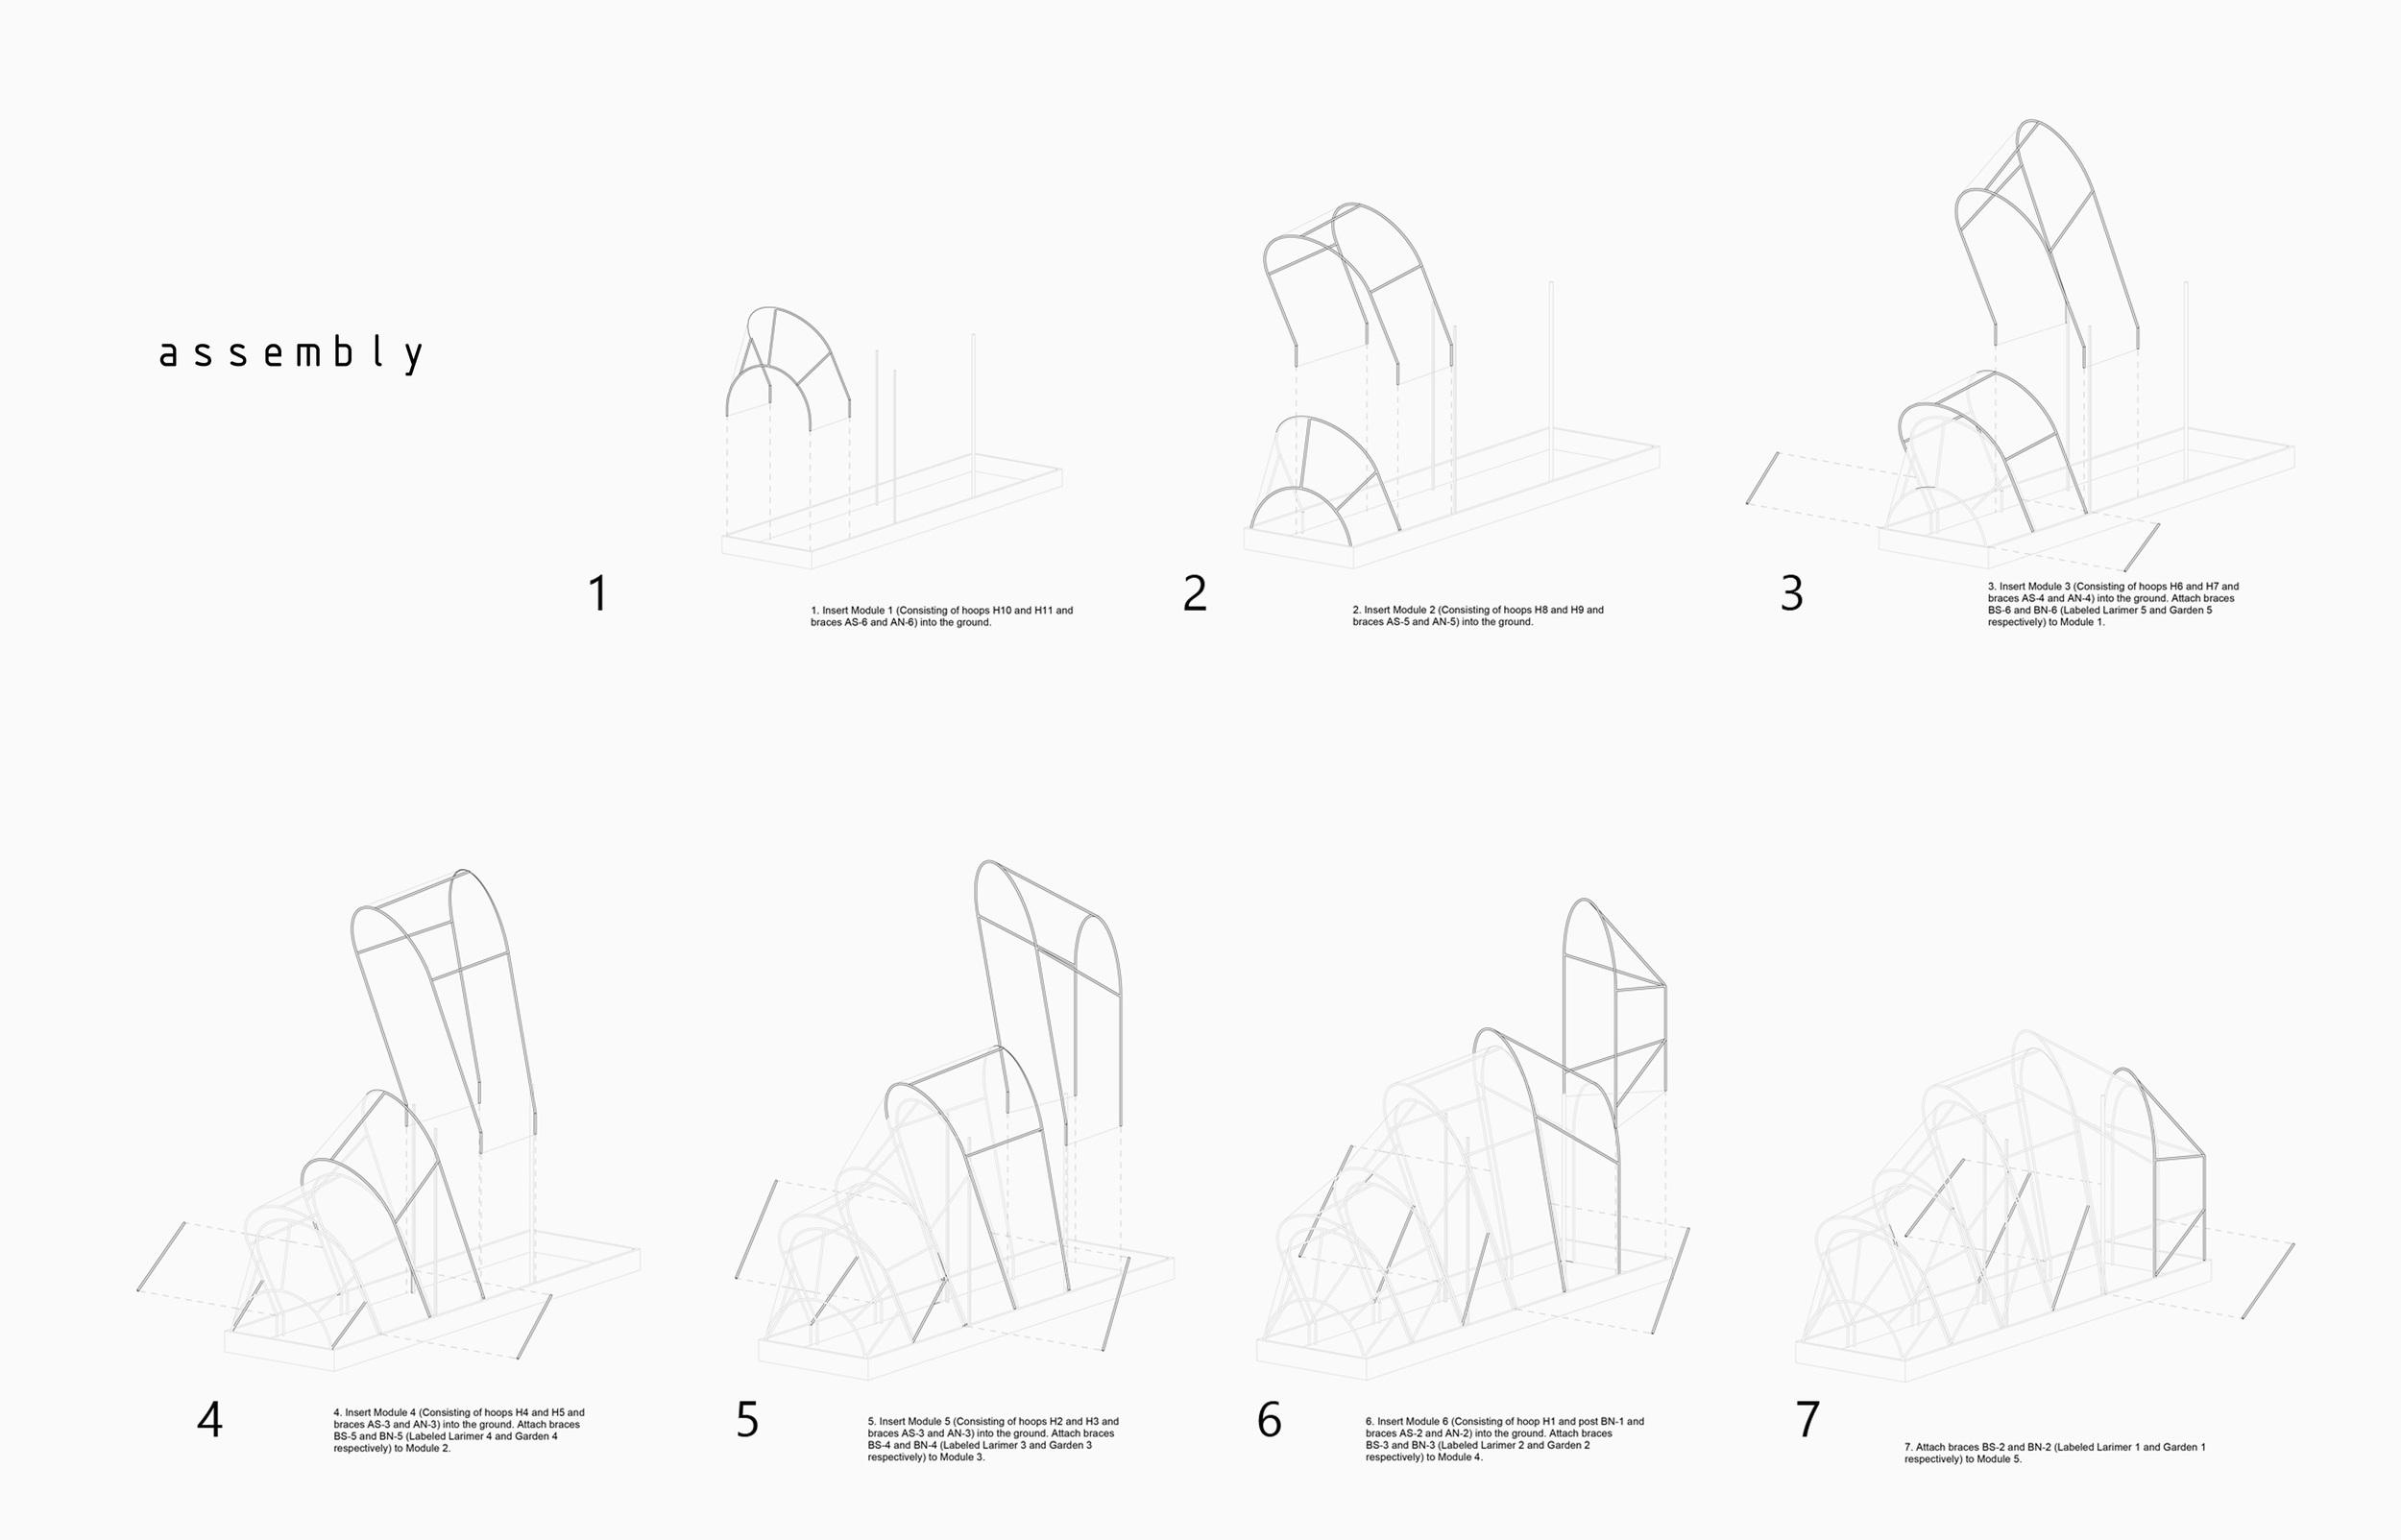 assembly1.jpg